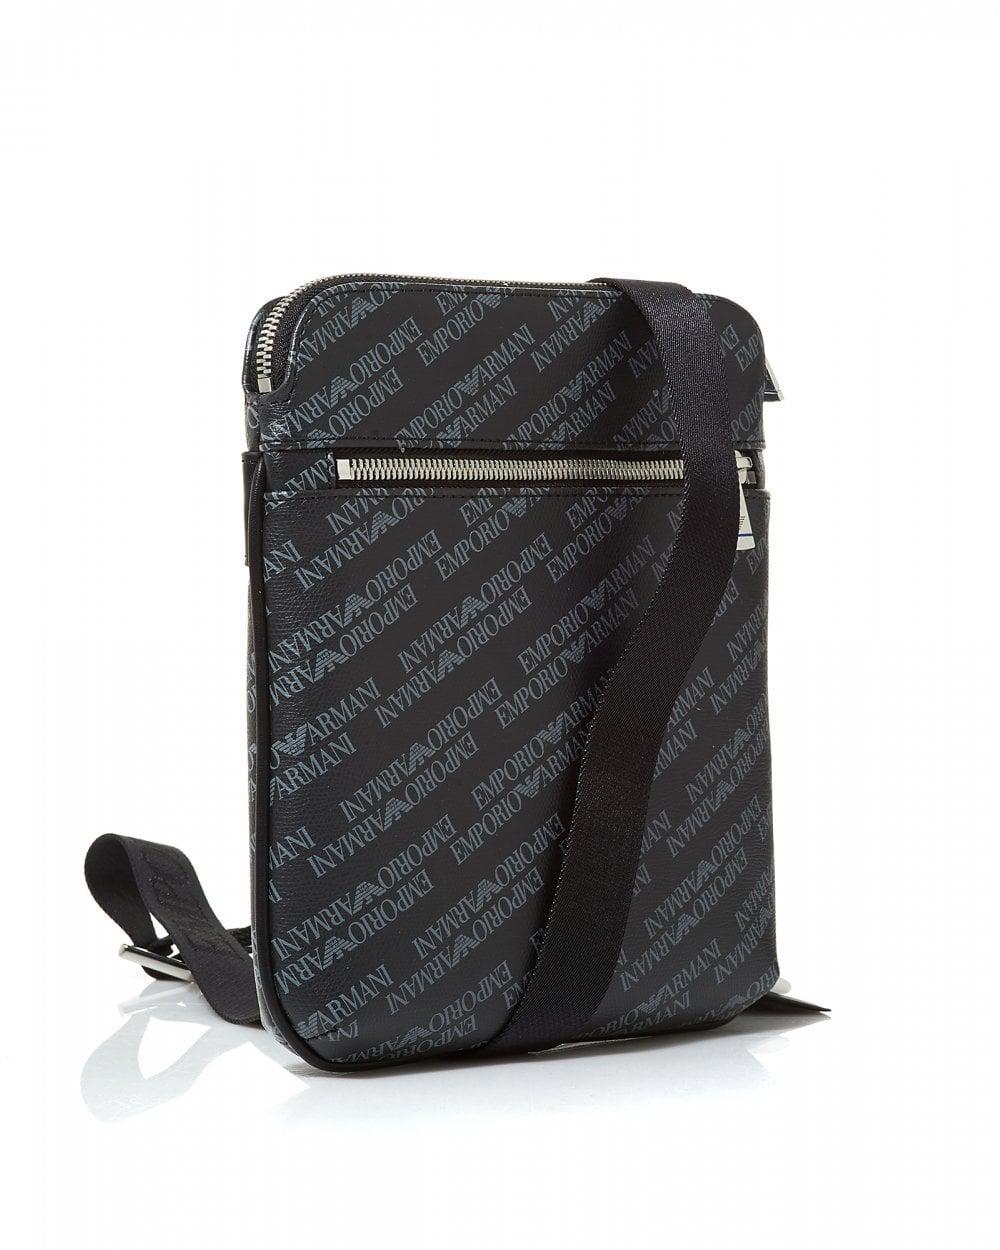 Emporio Armani All Over Logo Black Crossbody Stash Bag in Black for Men -  Lyst d1f8f7ca407ab